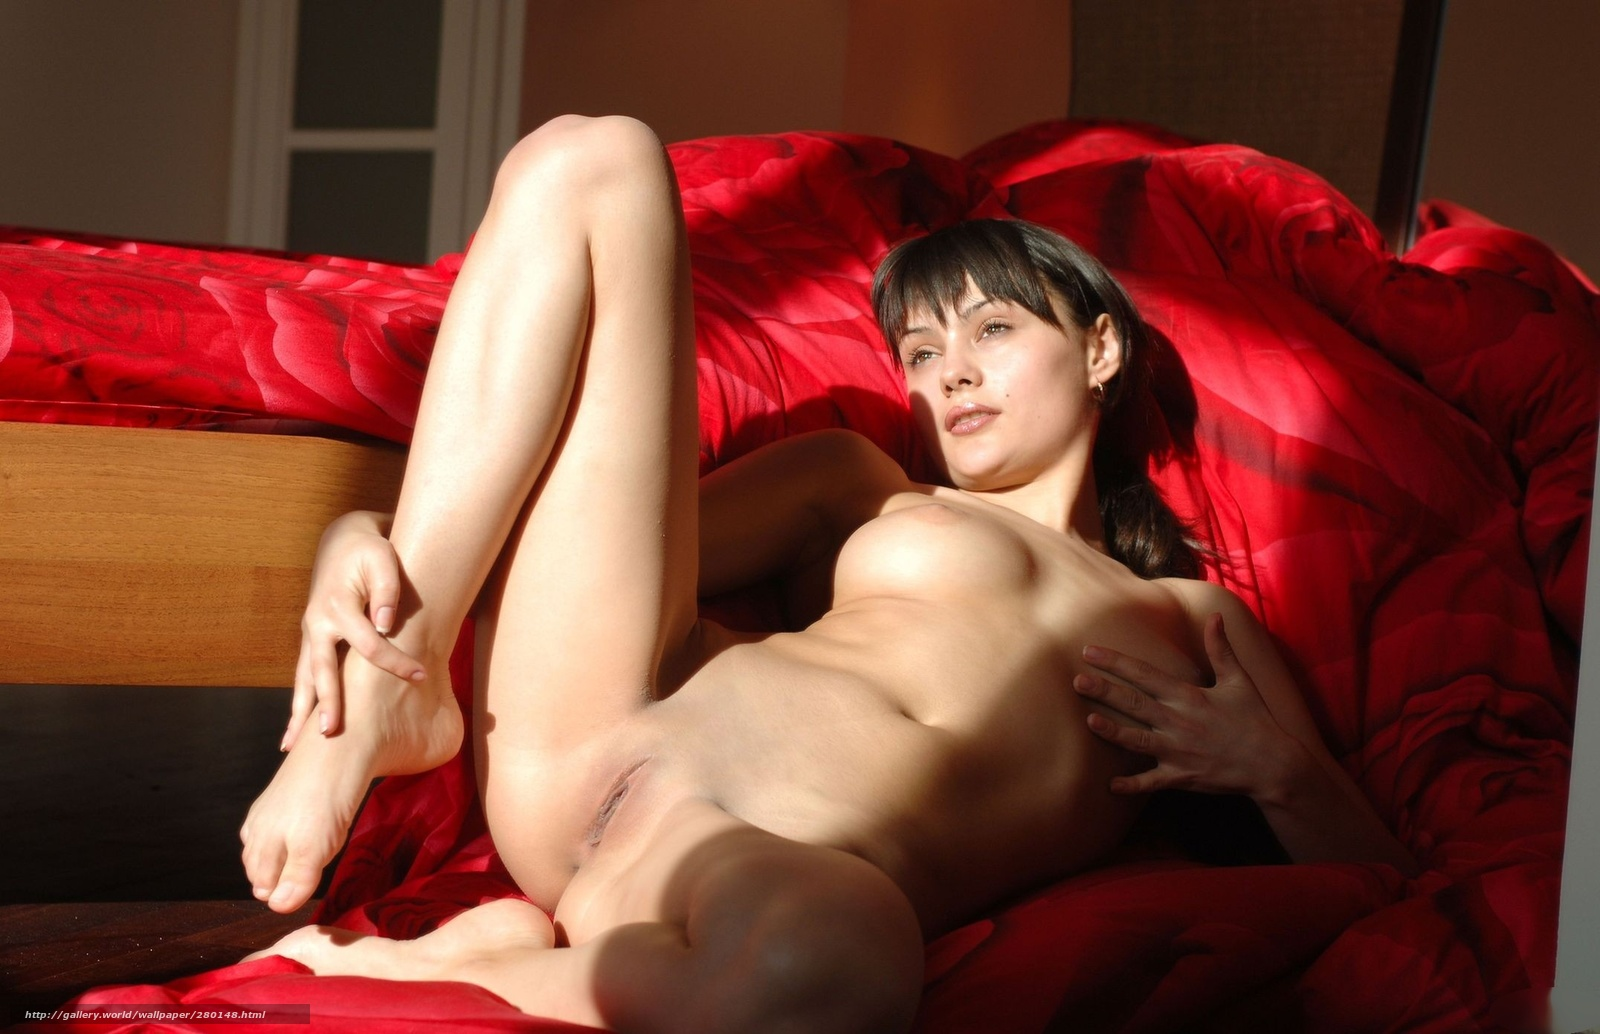 Эротика дома на диване, Порно На диване -видео. Смотреть порно онлайн! 17 фотография